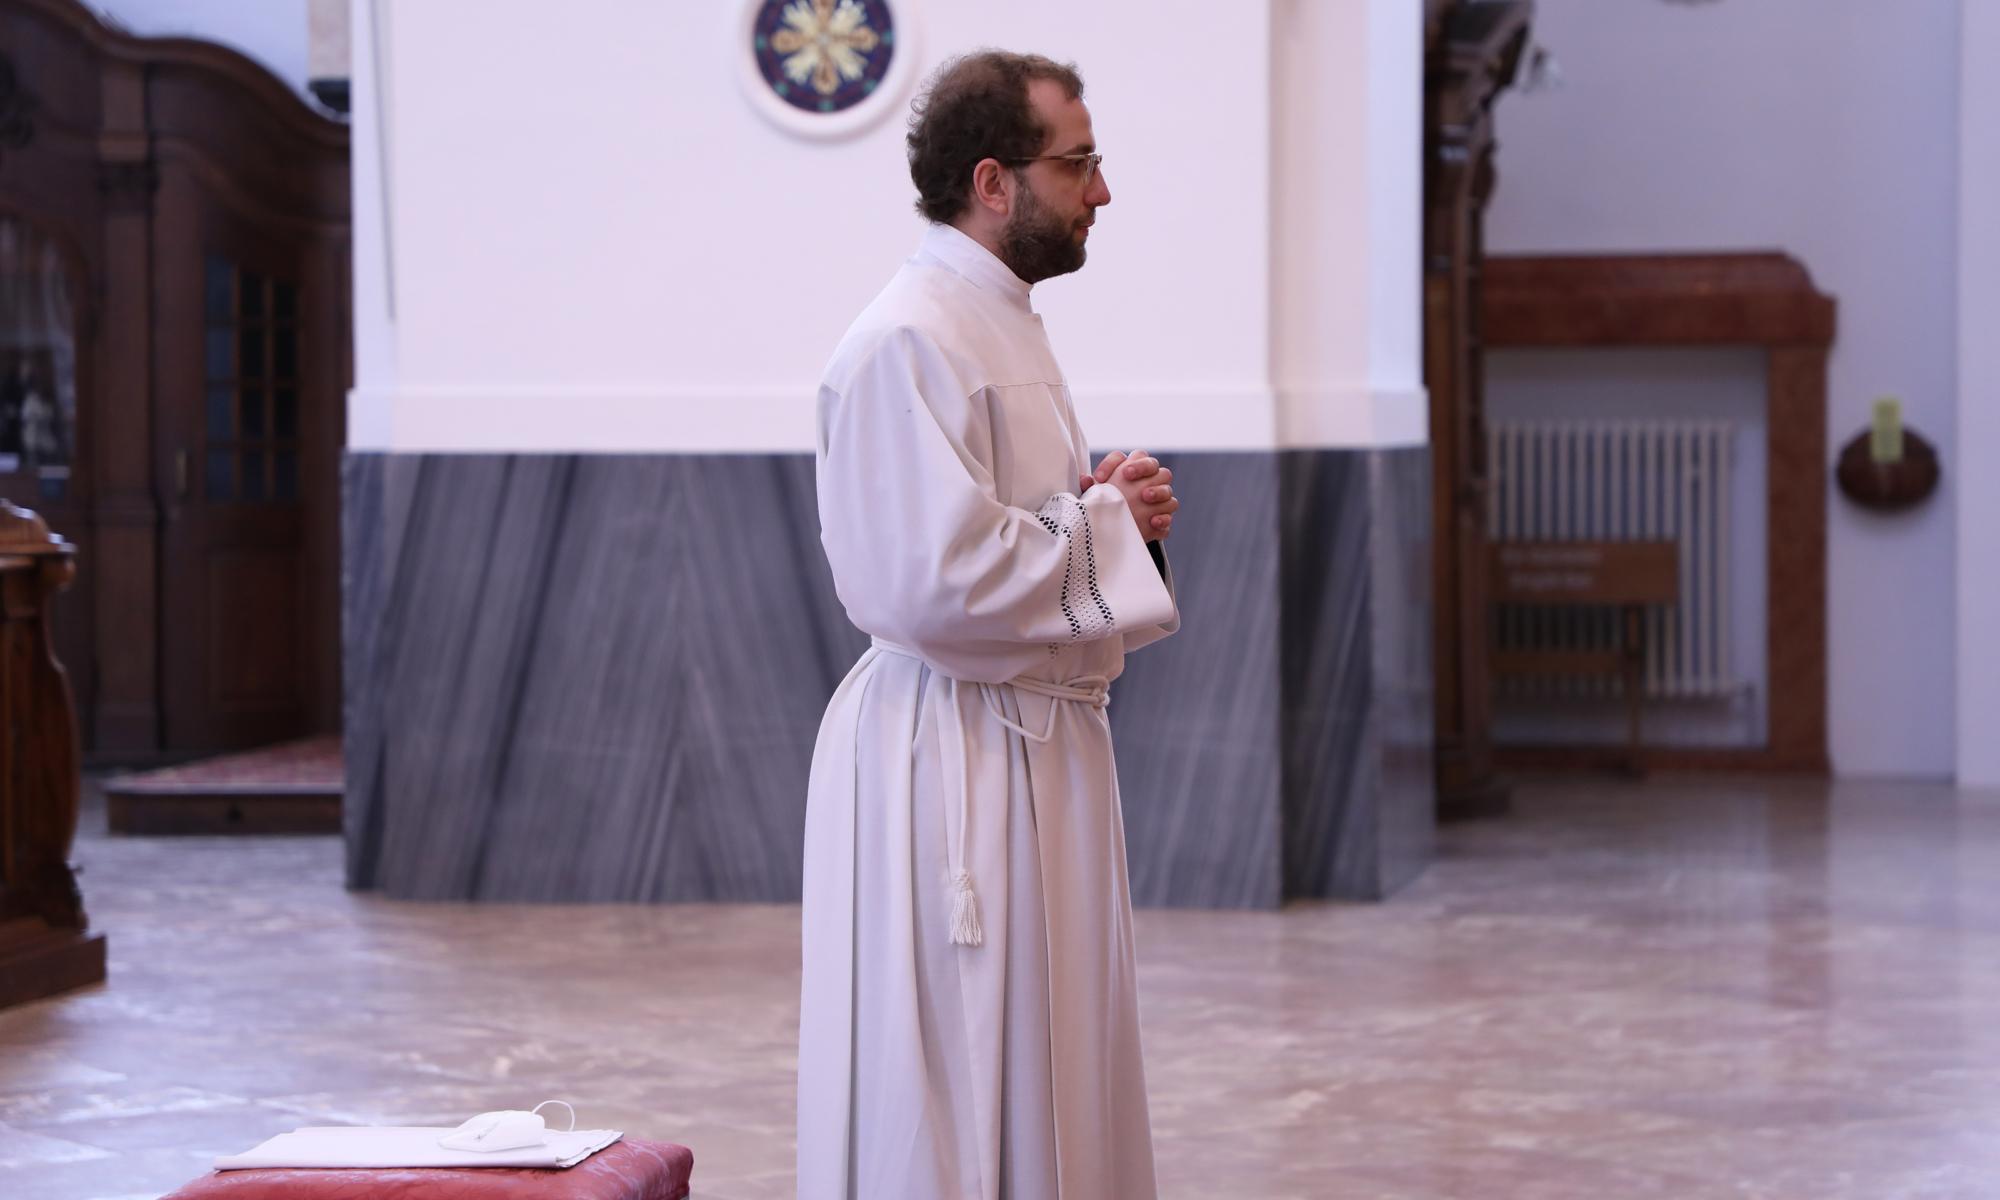 201205 Diakonenweihe Bosanyi foto2